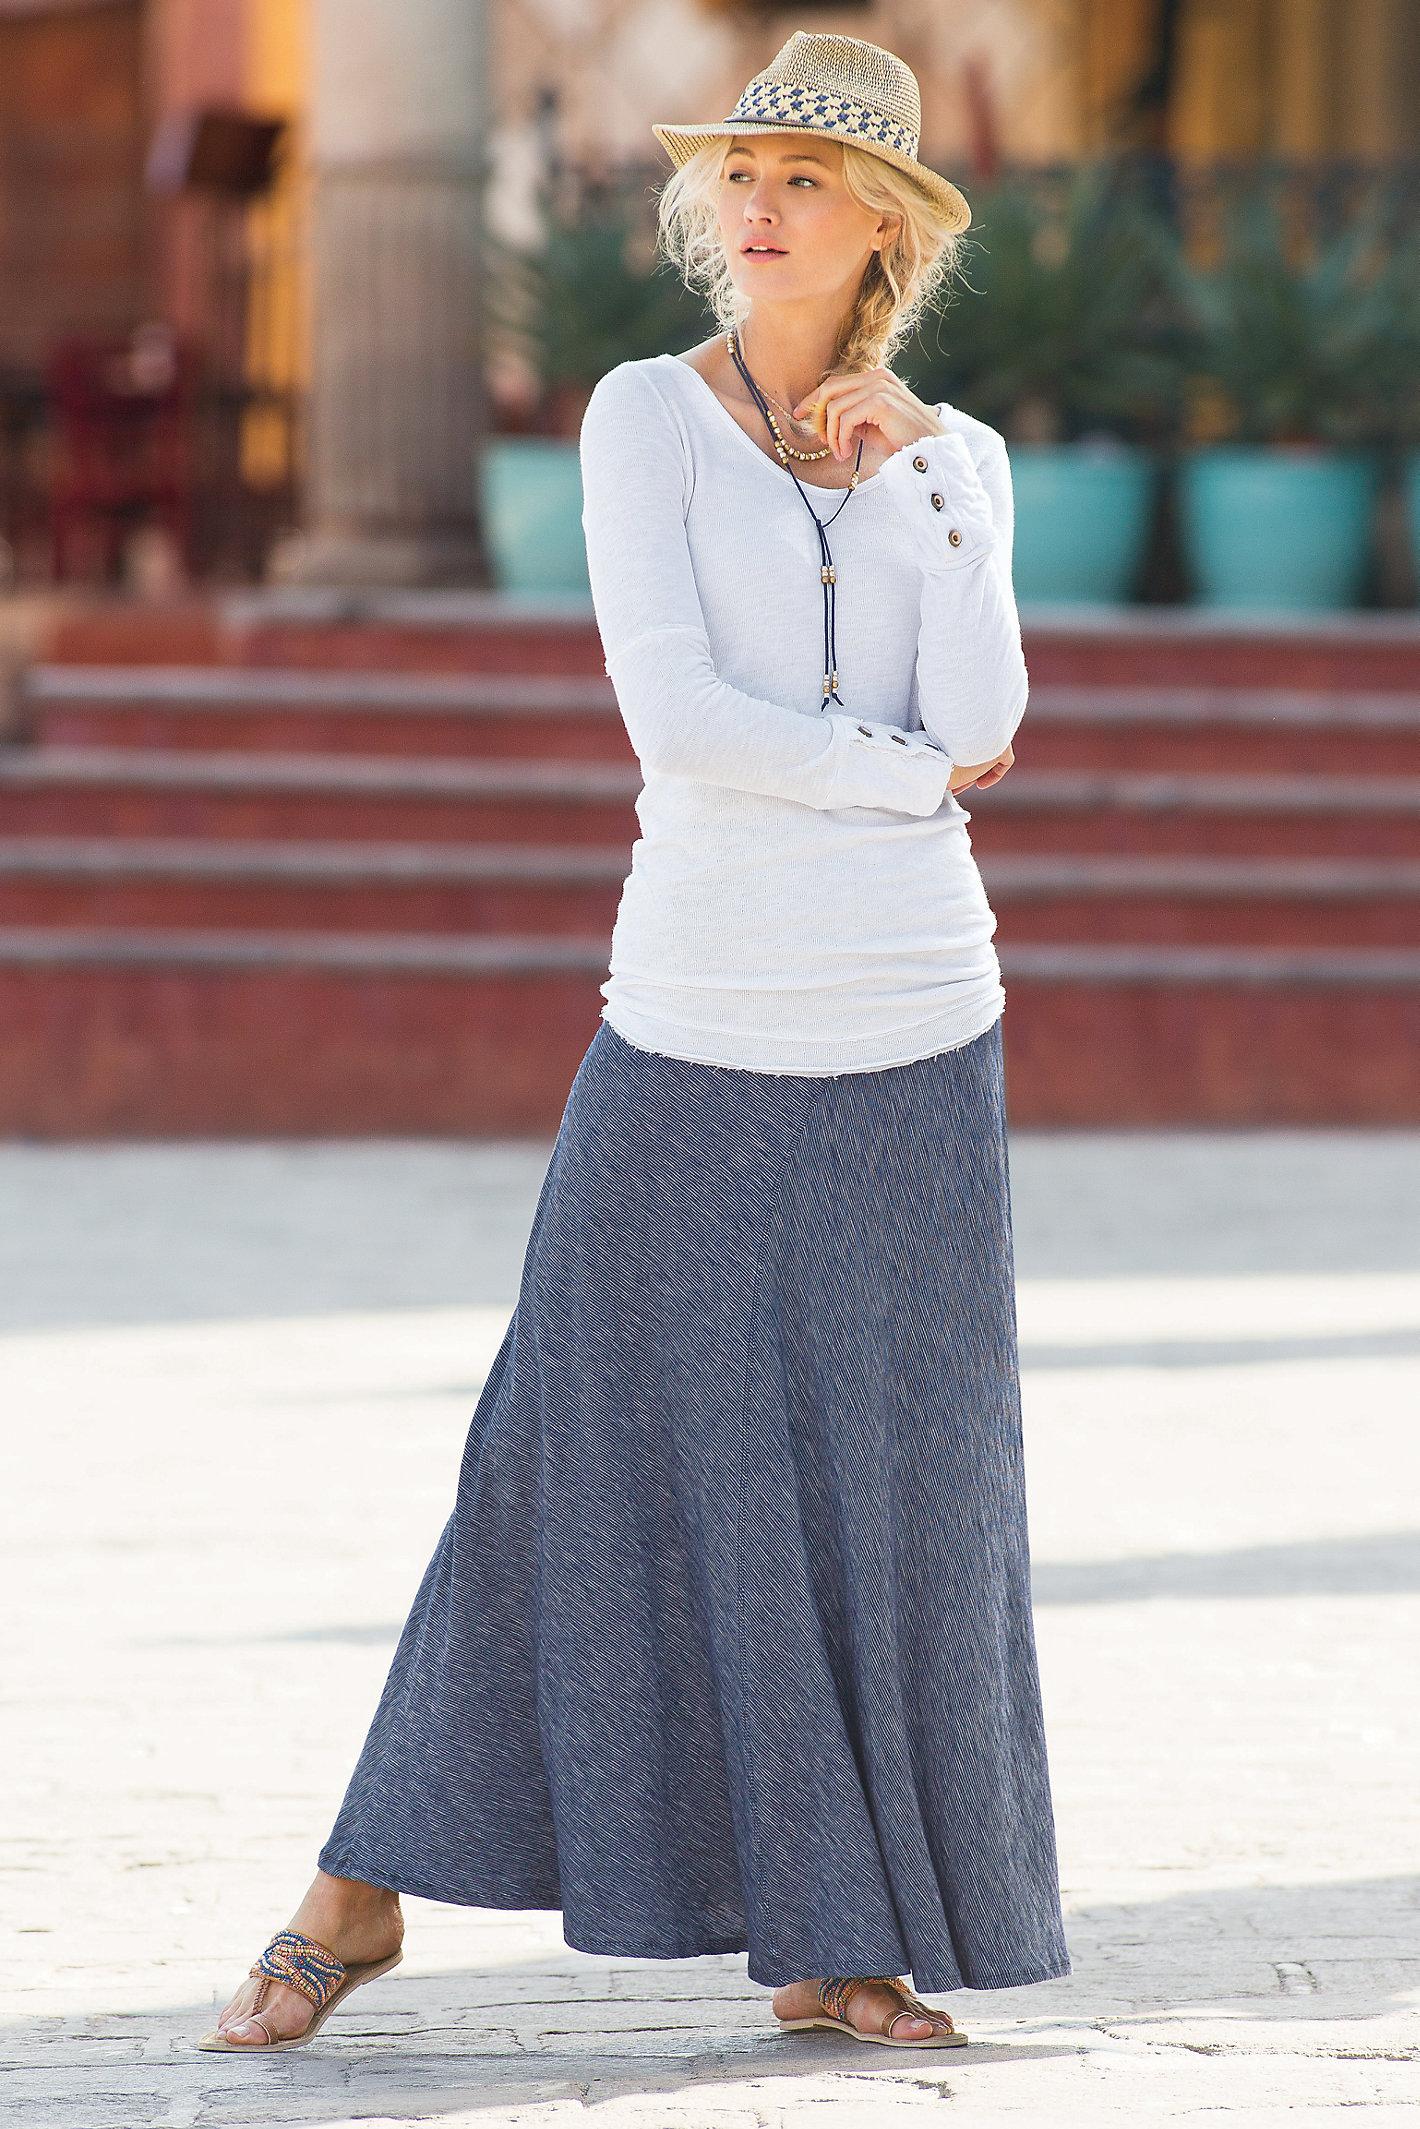 Agean Sea Skirt